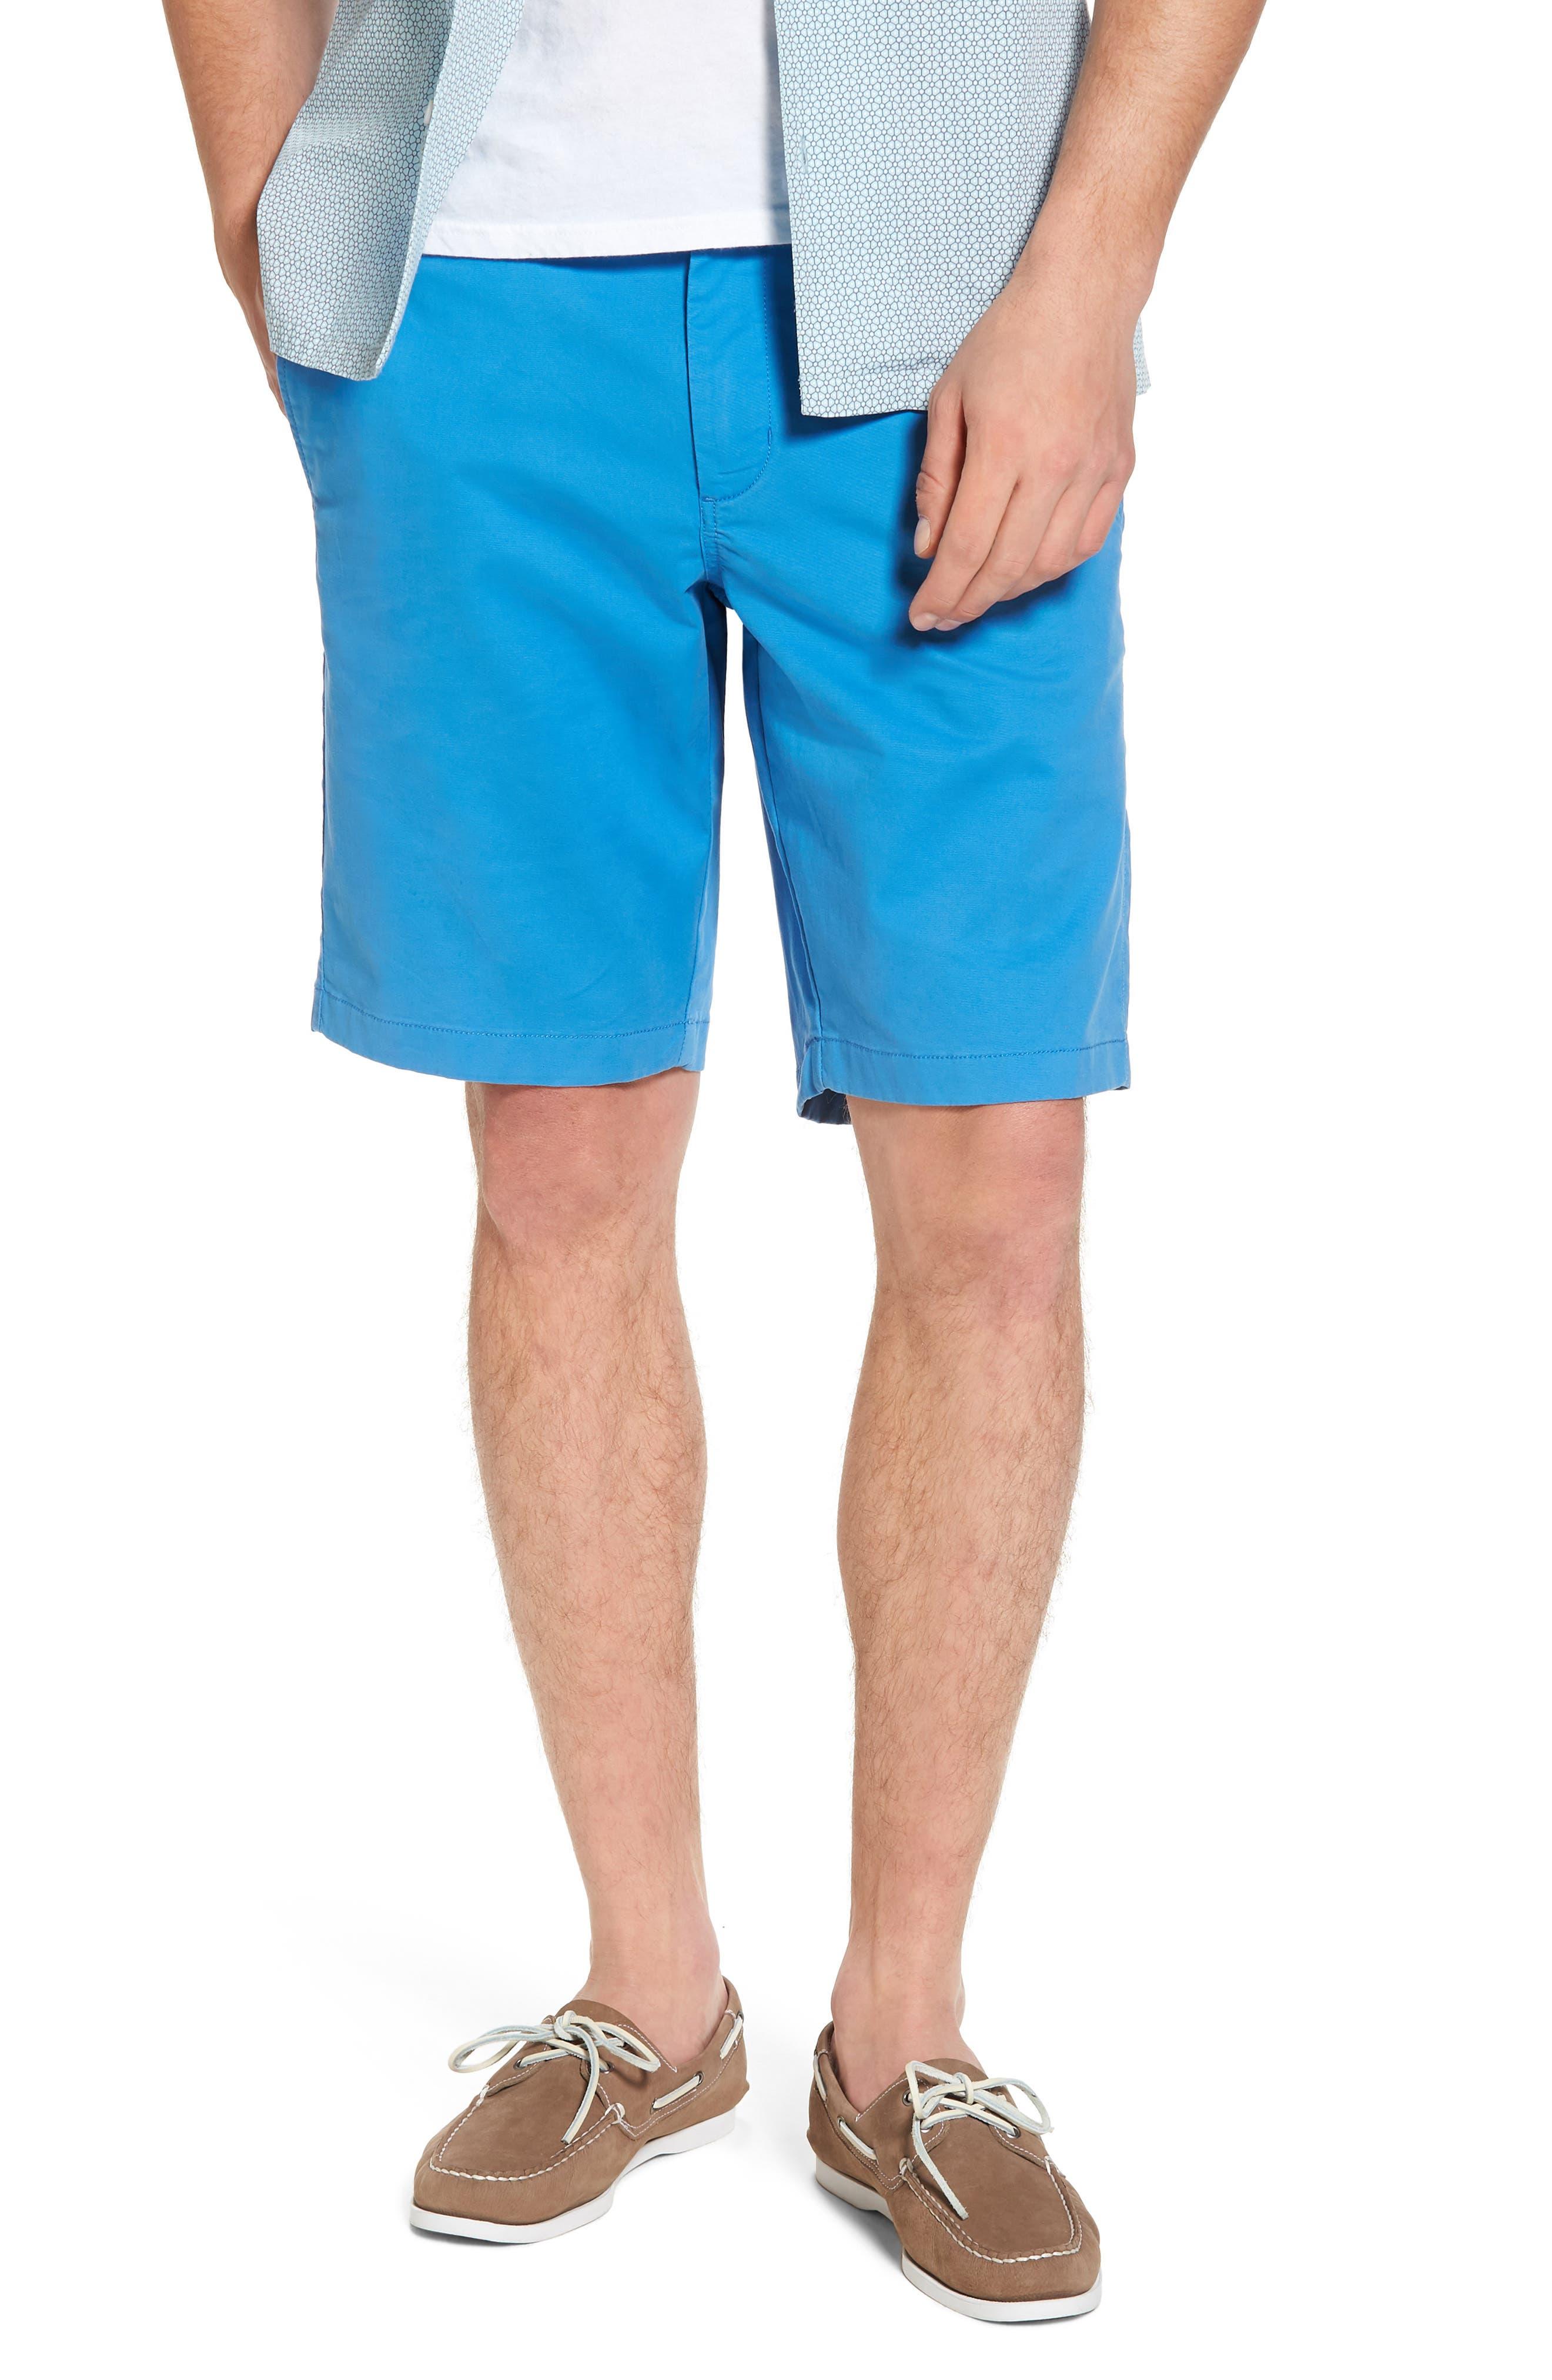 Ballard Slim Fit Stretch Chino 11-Inch Shorts,                             Main thumbnail 1, color,                             Blue Camp